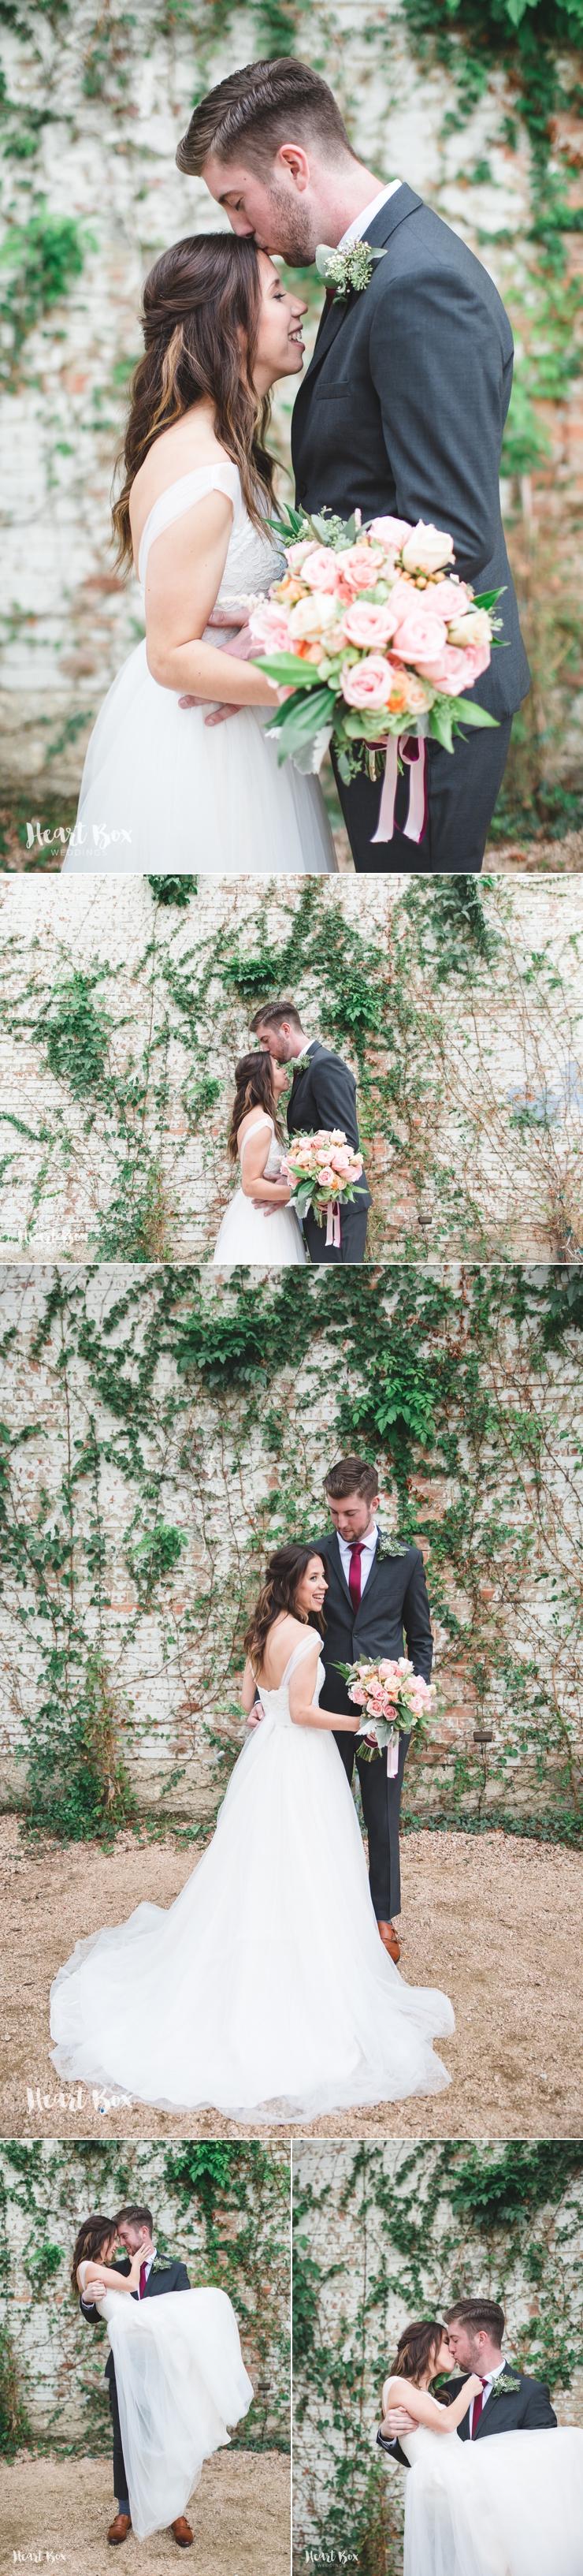 Hicks Wedding 11.jpg